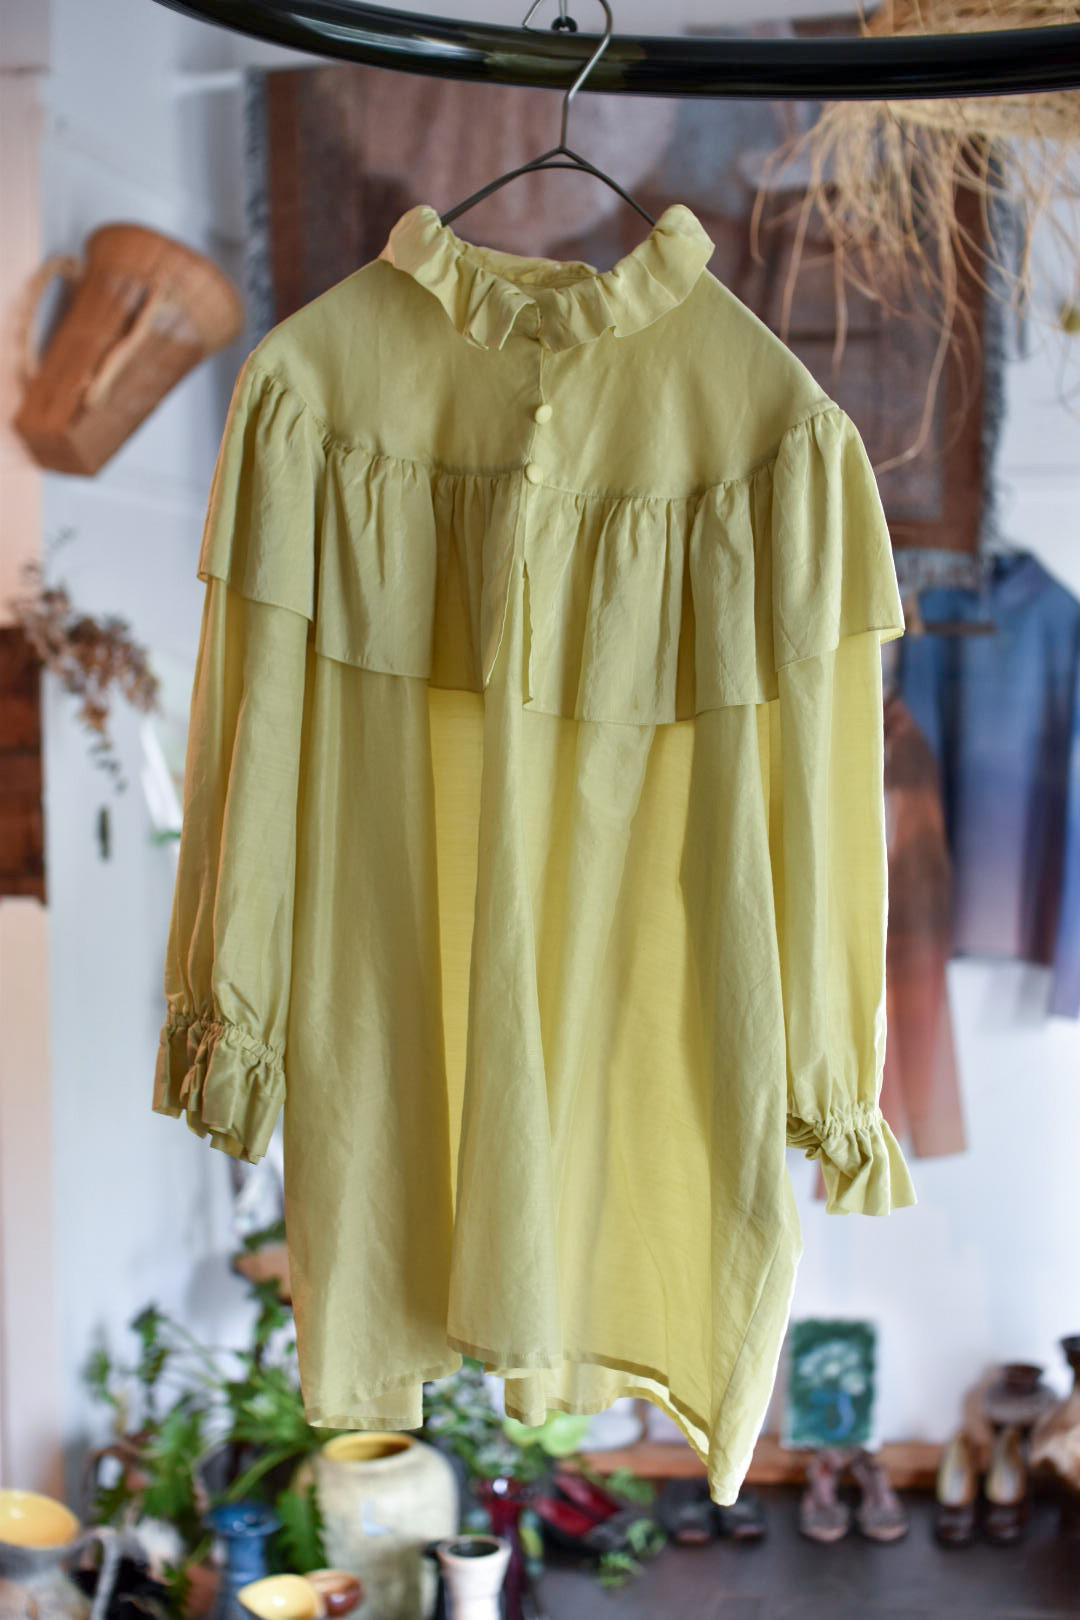 Yves Saint Laurent fril blouse